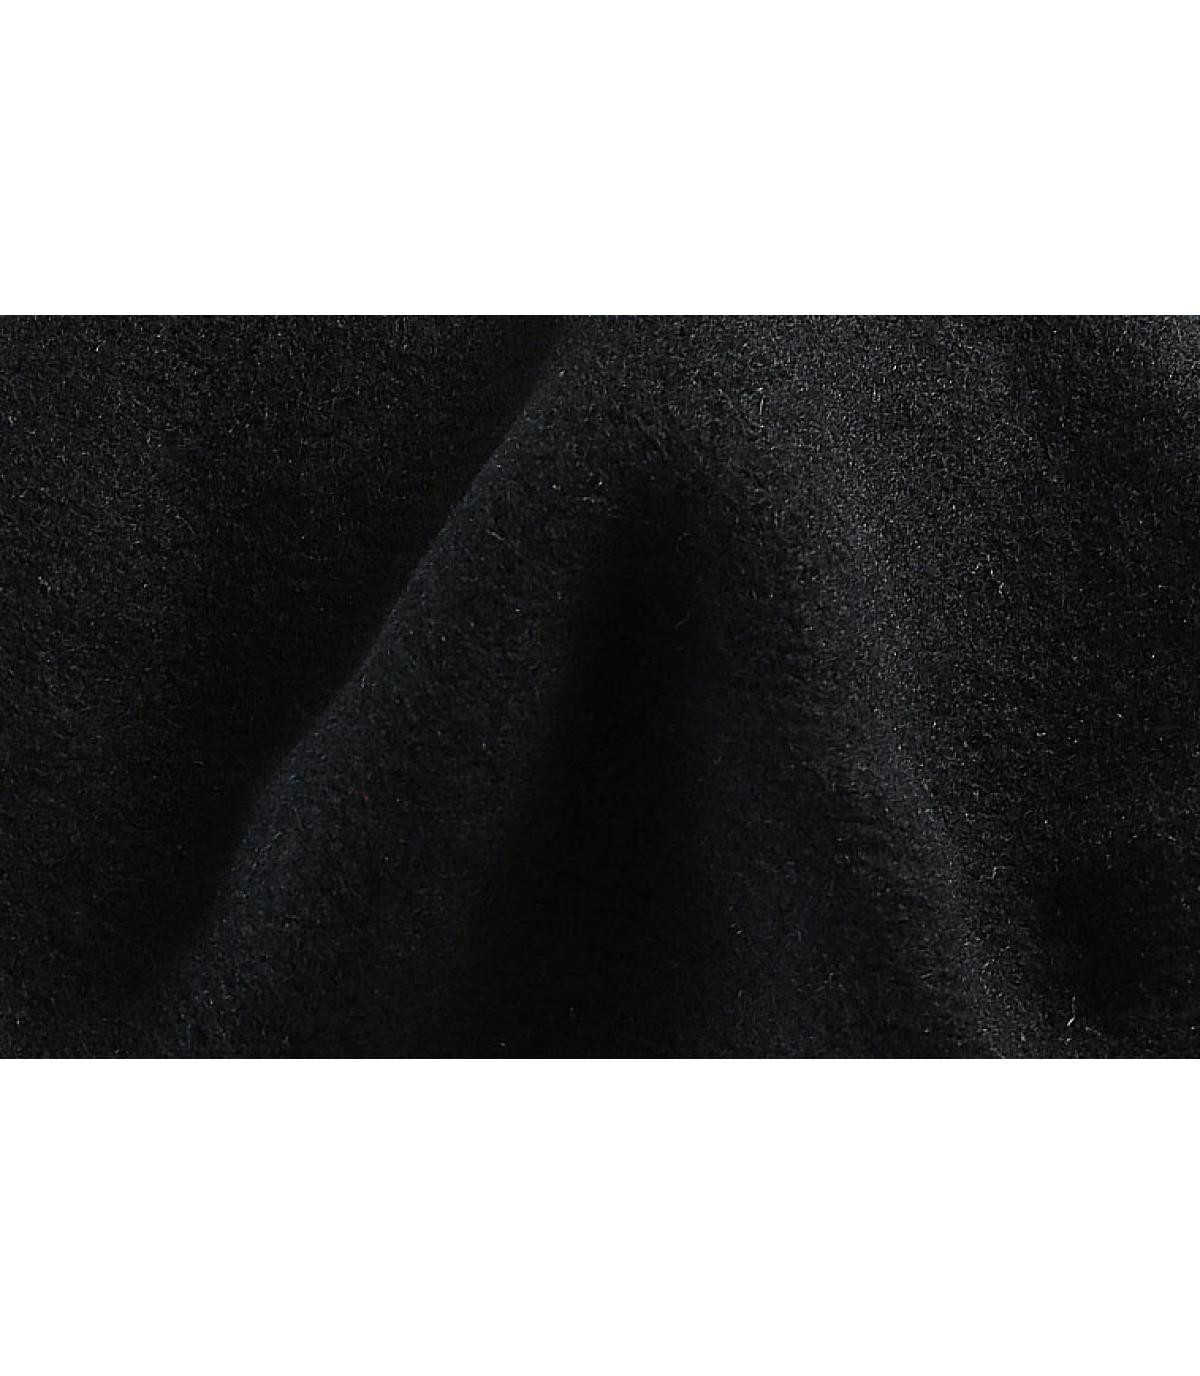 Detalles Black french beret imagen 3